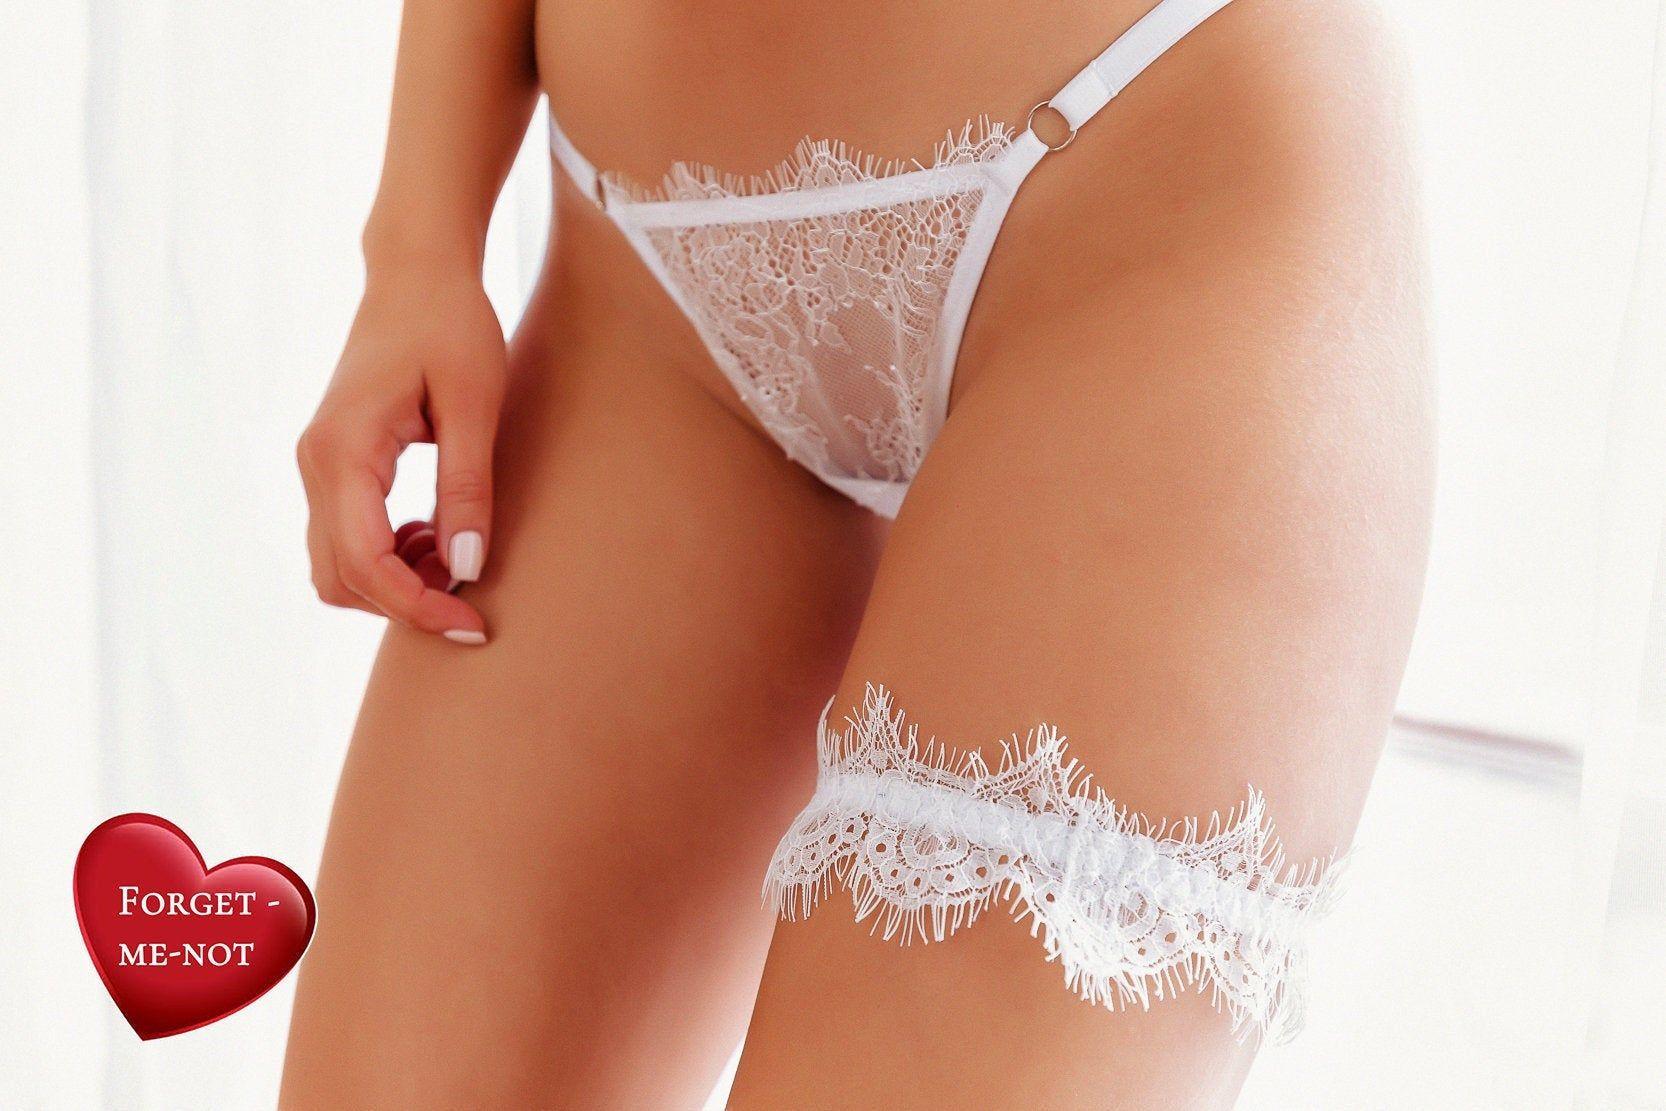 White Lingerie Bridal Lingerie Set Wedding Lingerie Set Bridal Lingerie Lace Bra Wedding Panties Cotton Panties Sheer Bra